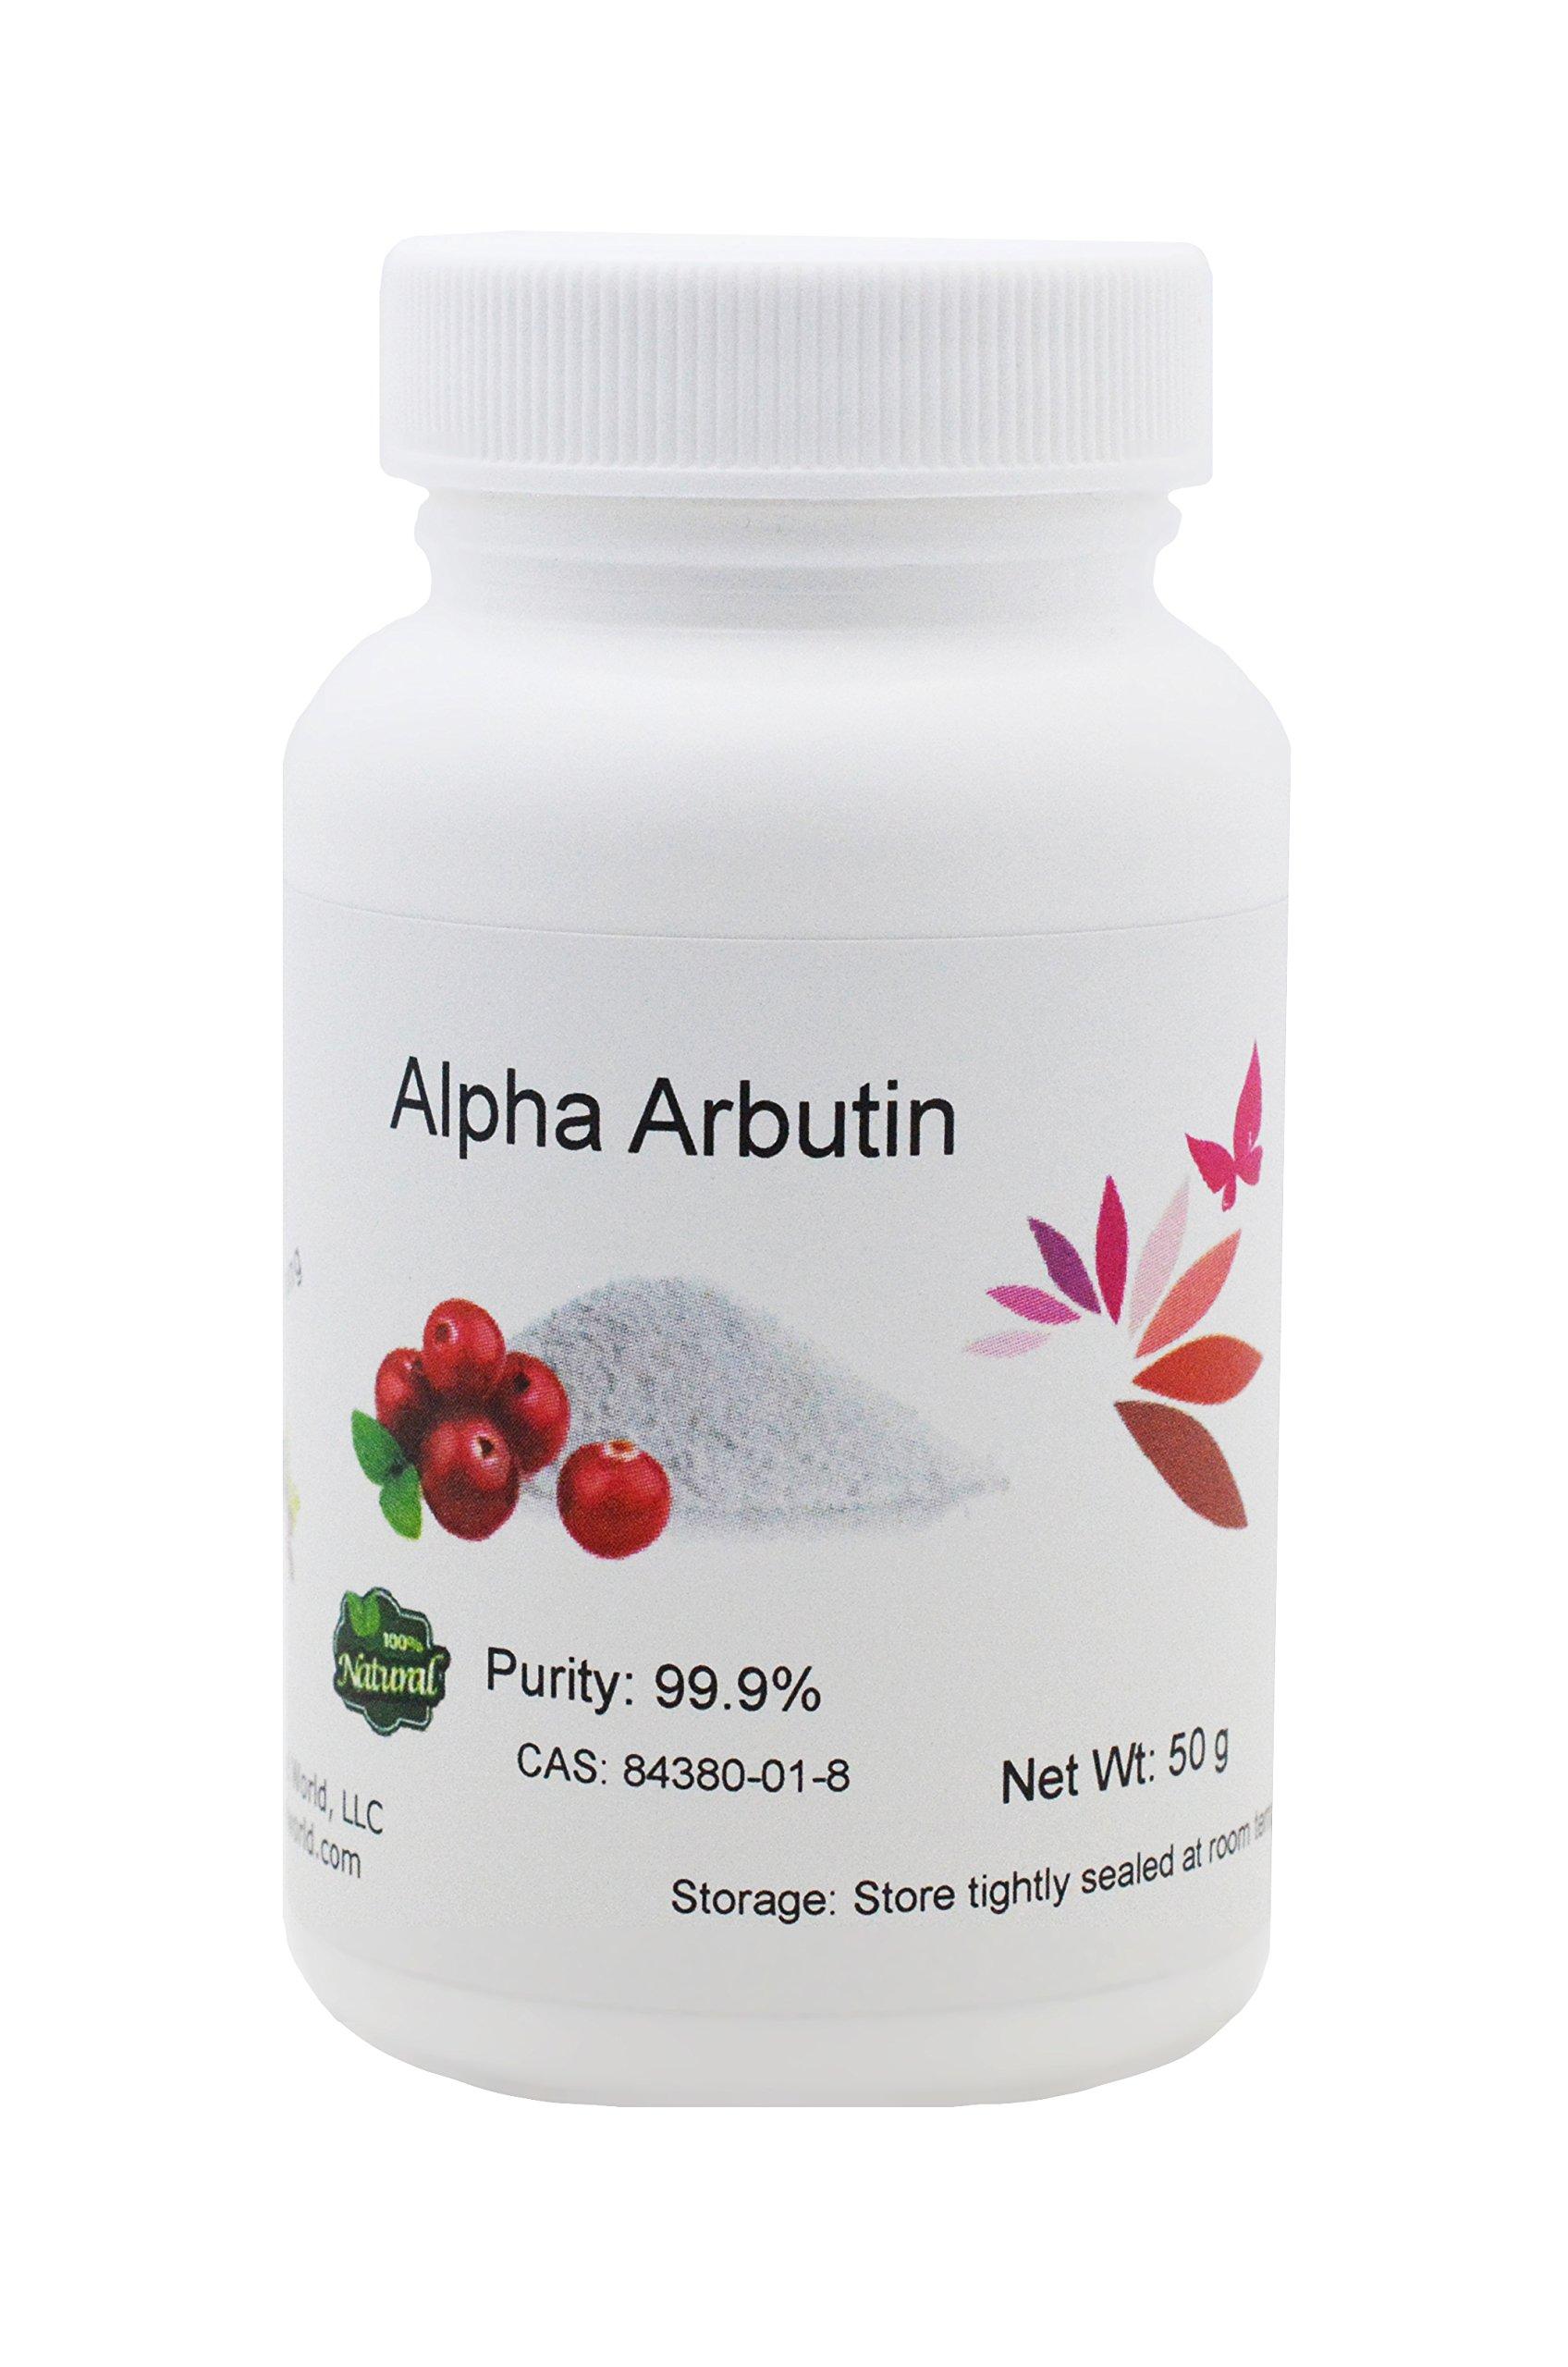 Pure Alpha-Arbutin Powder, 100 grams, Quality Guaranteed! Good for Skin Lightening